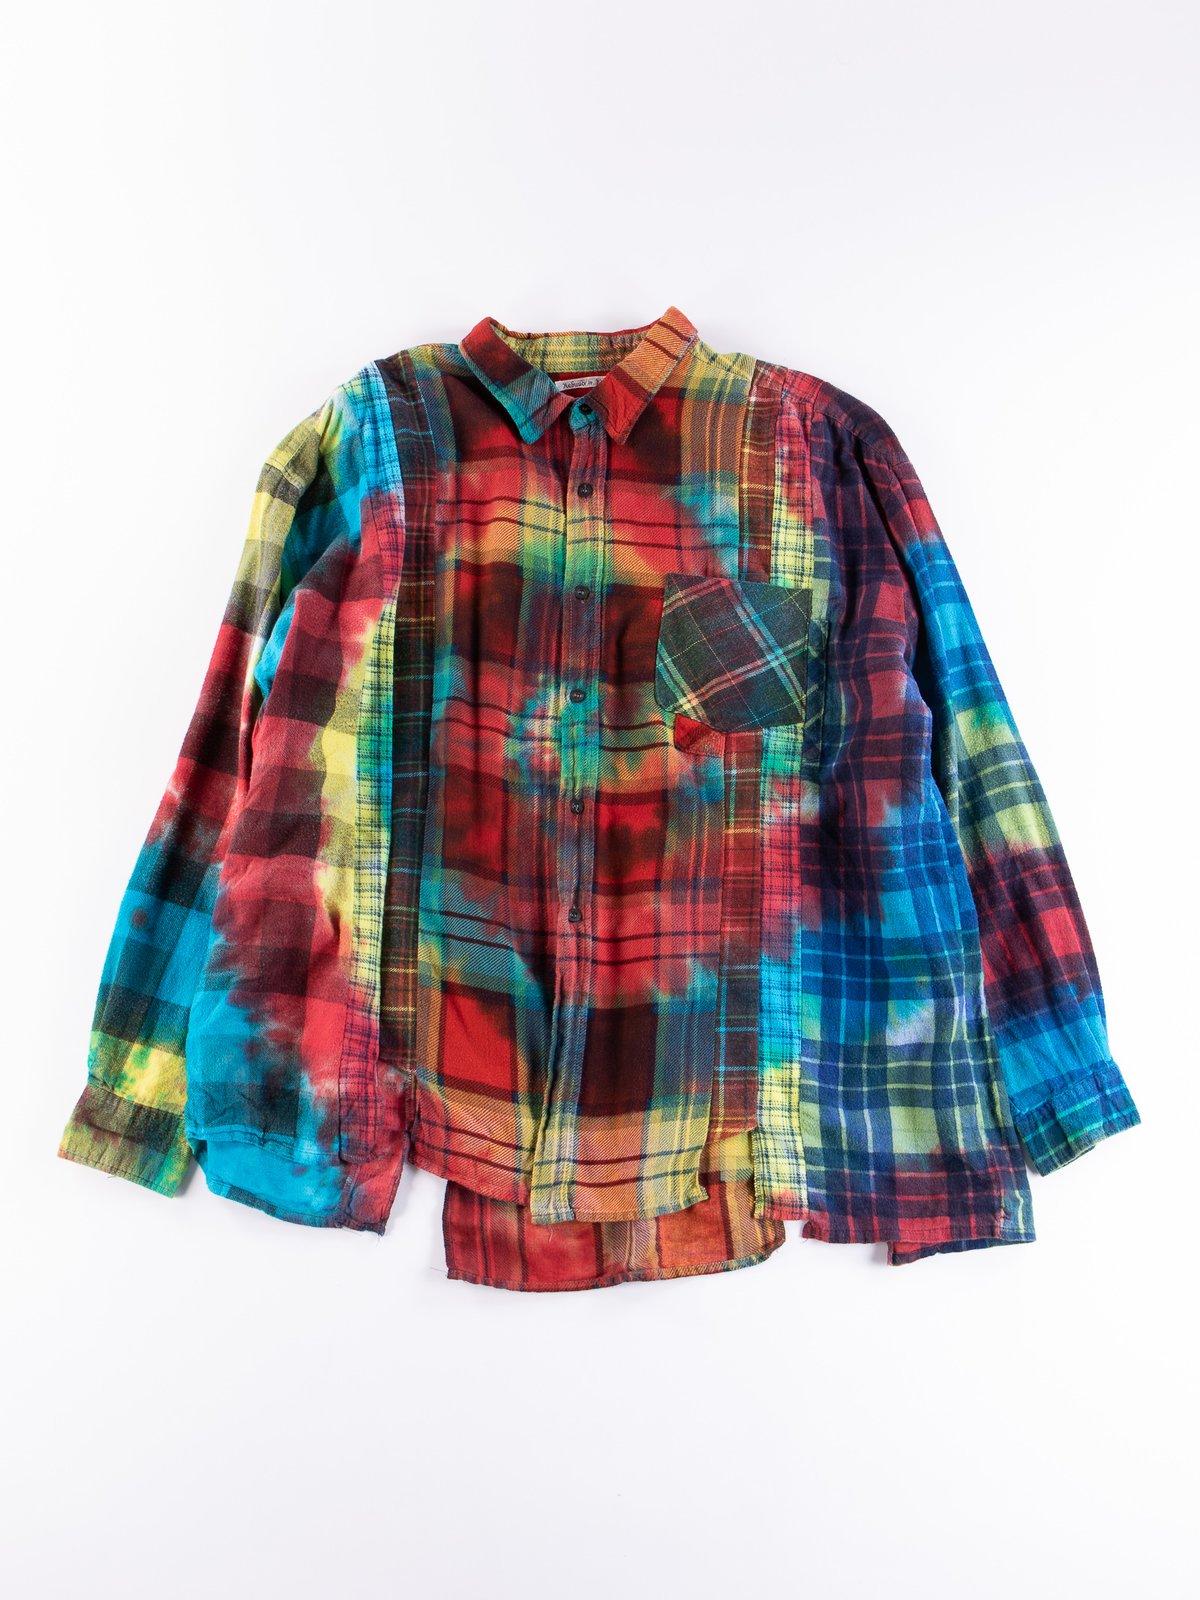 Tie Dye Assorted 7 Cuts Rebuild Shirt - Image 7